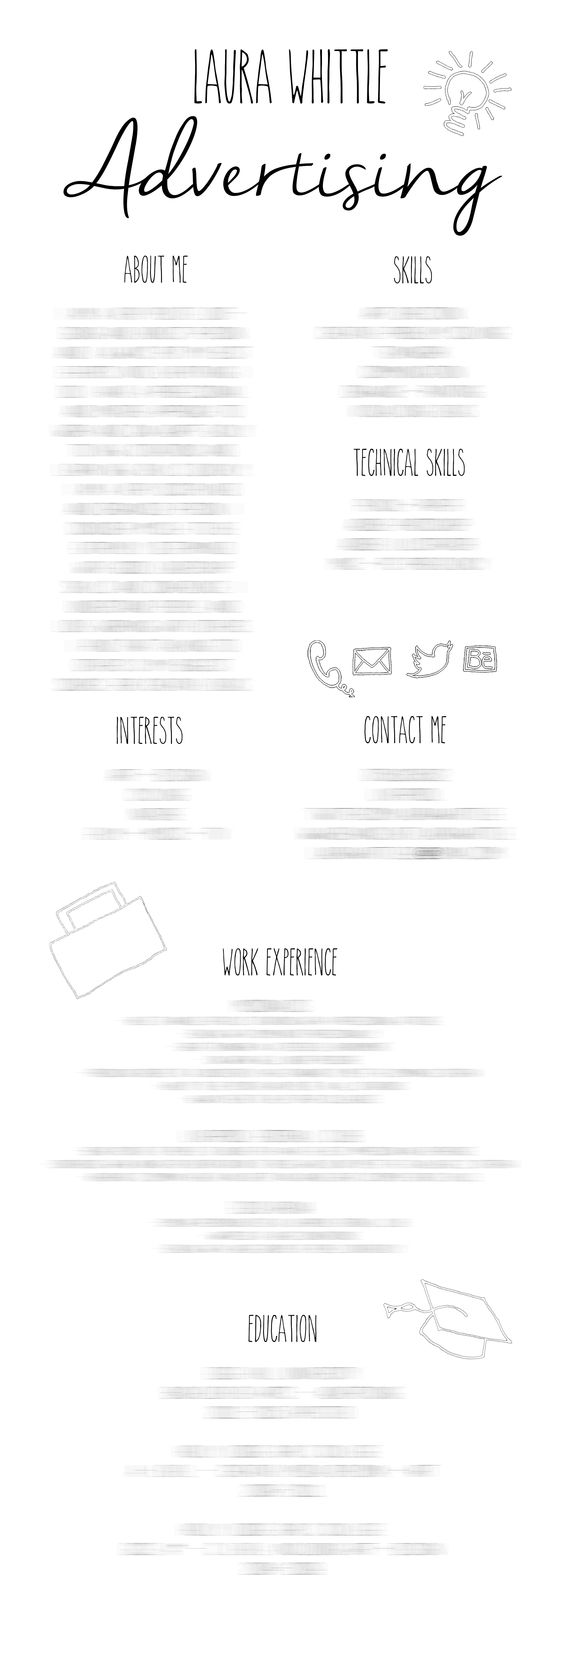 creative cv layout simple black white advertising branding creative cv layout simple black white advertising branding student